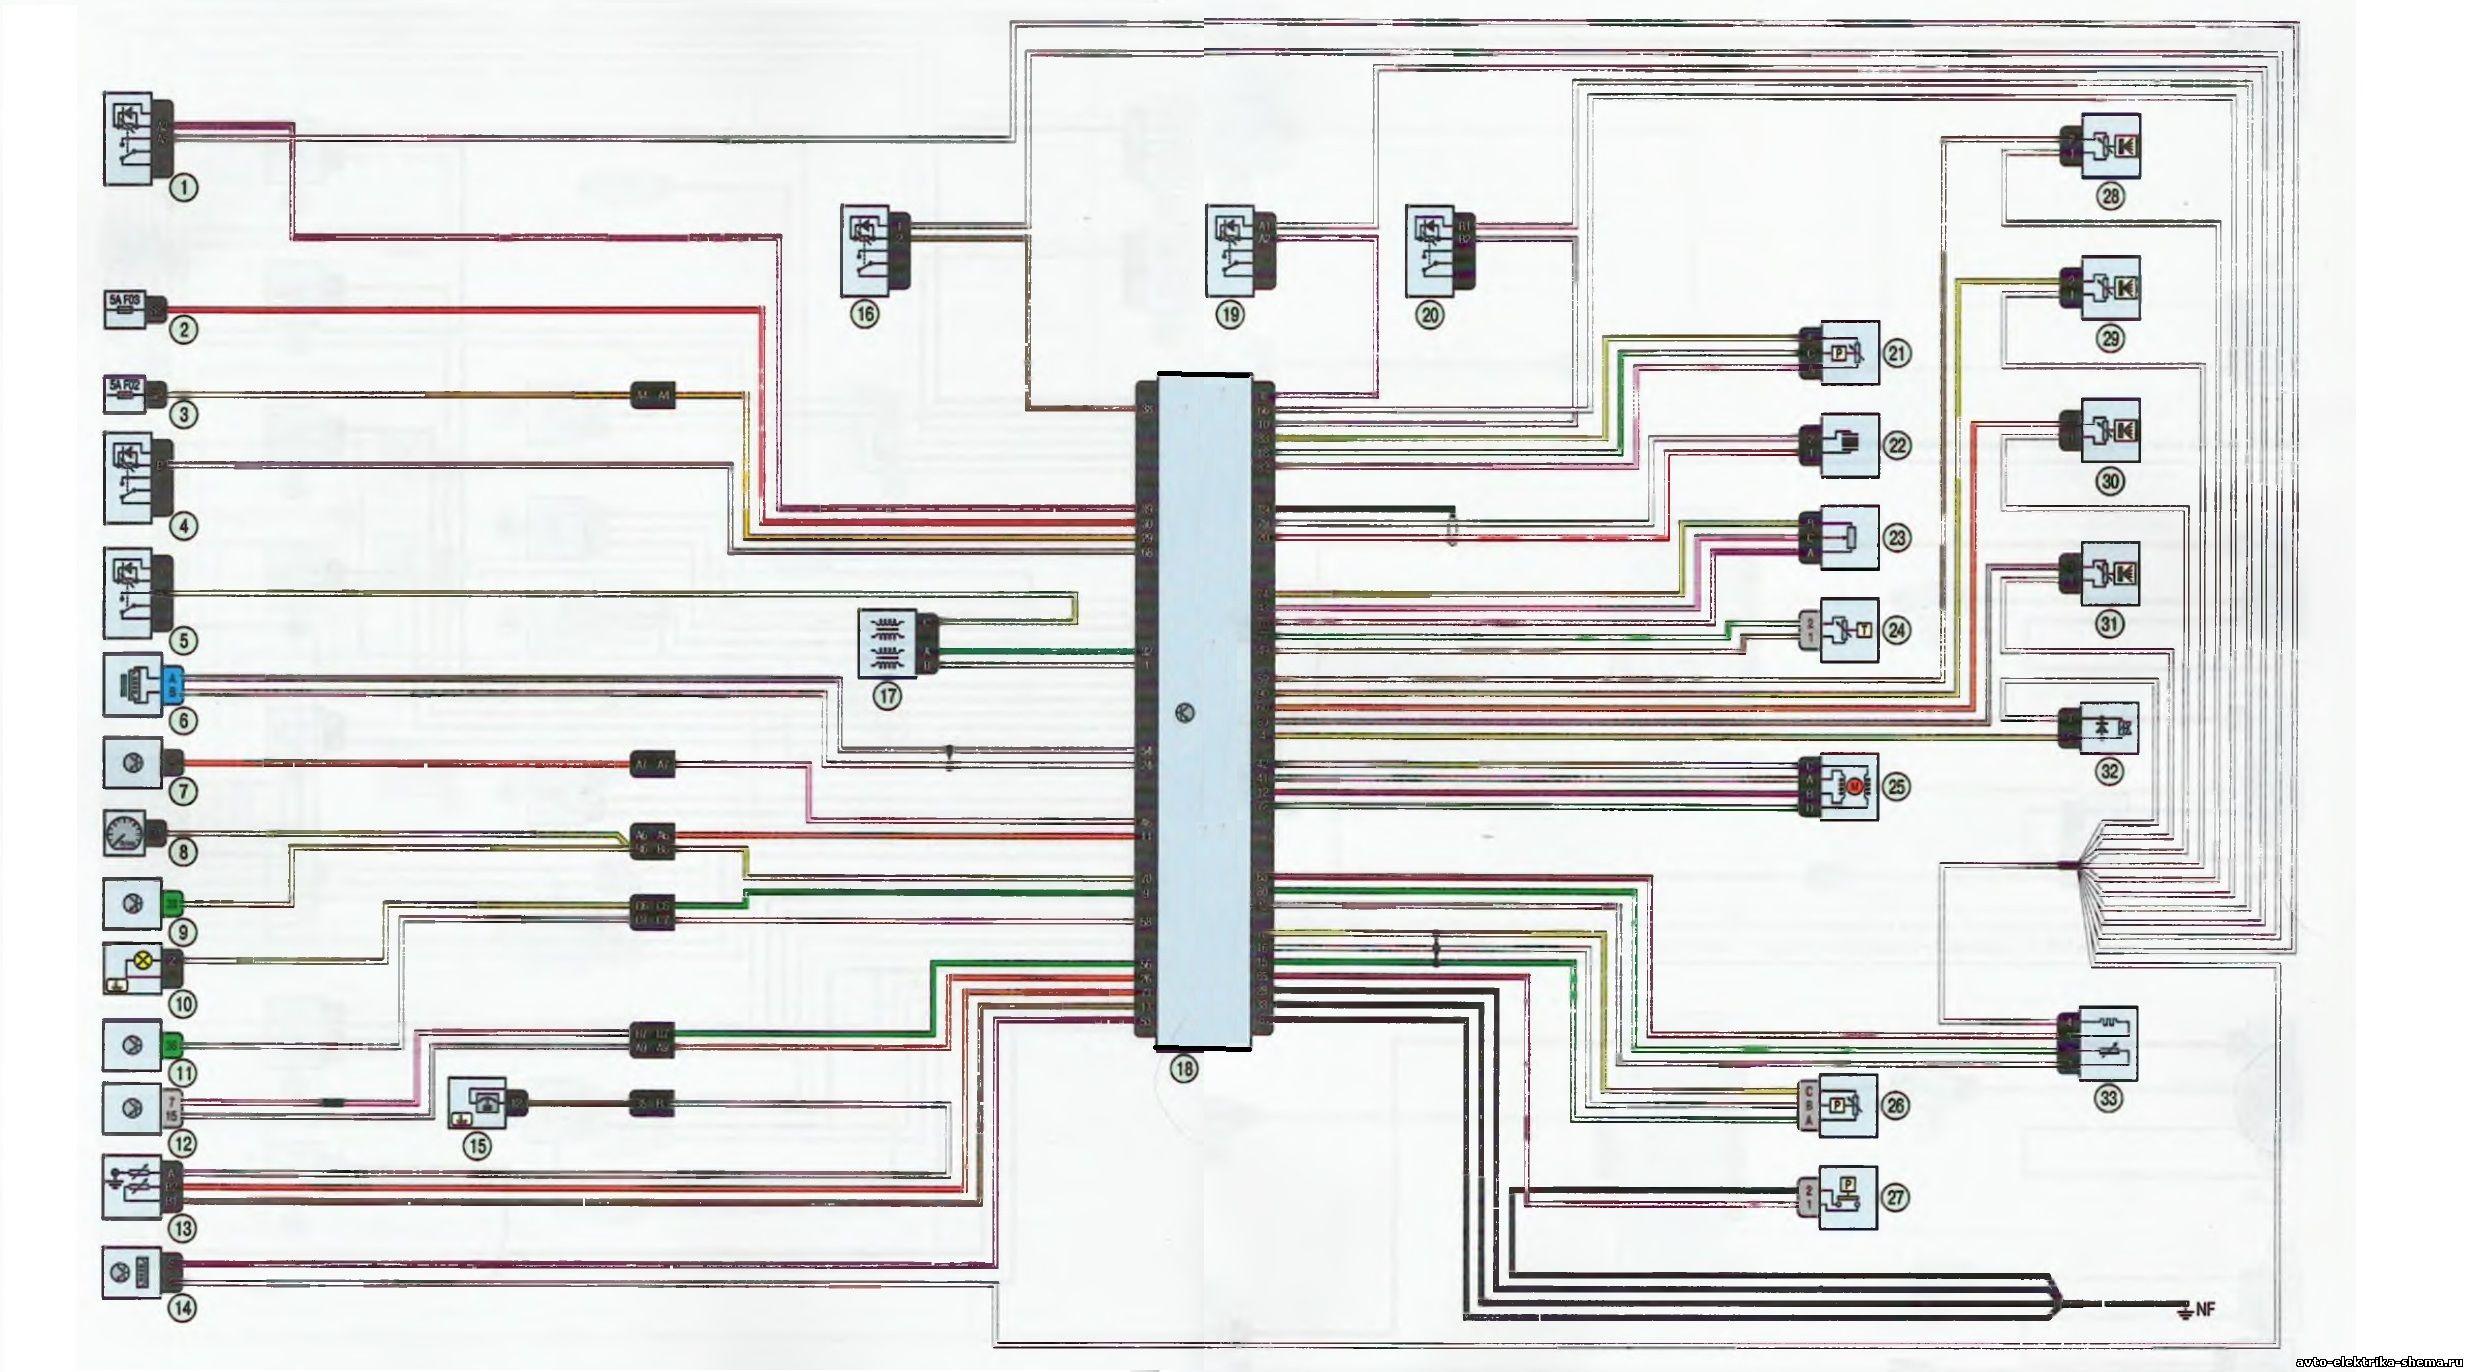 s2 - Схема центрального замка ларгус